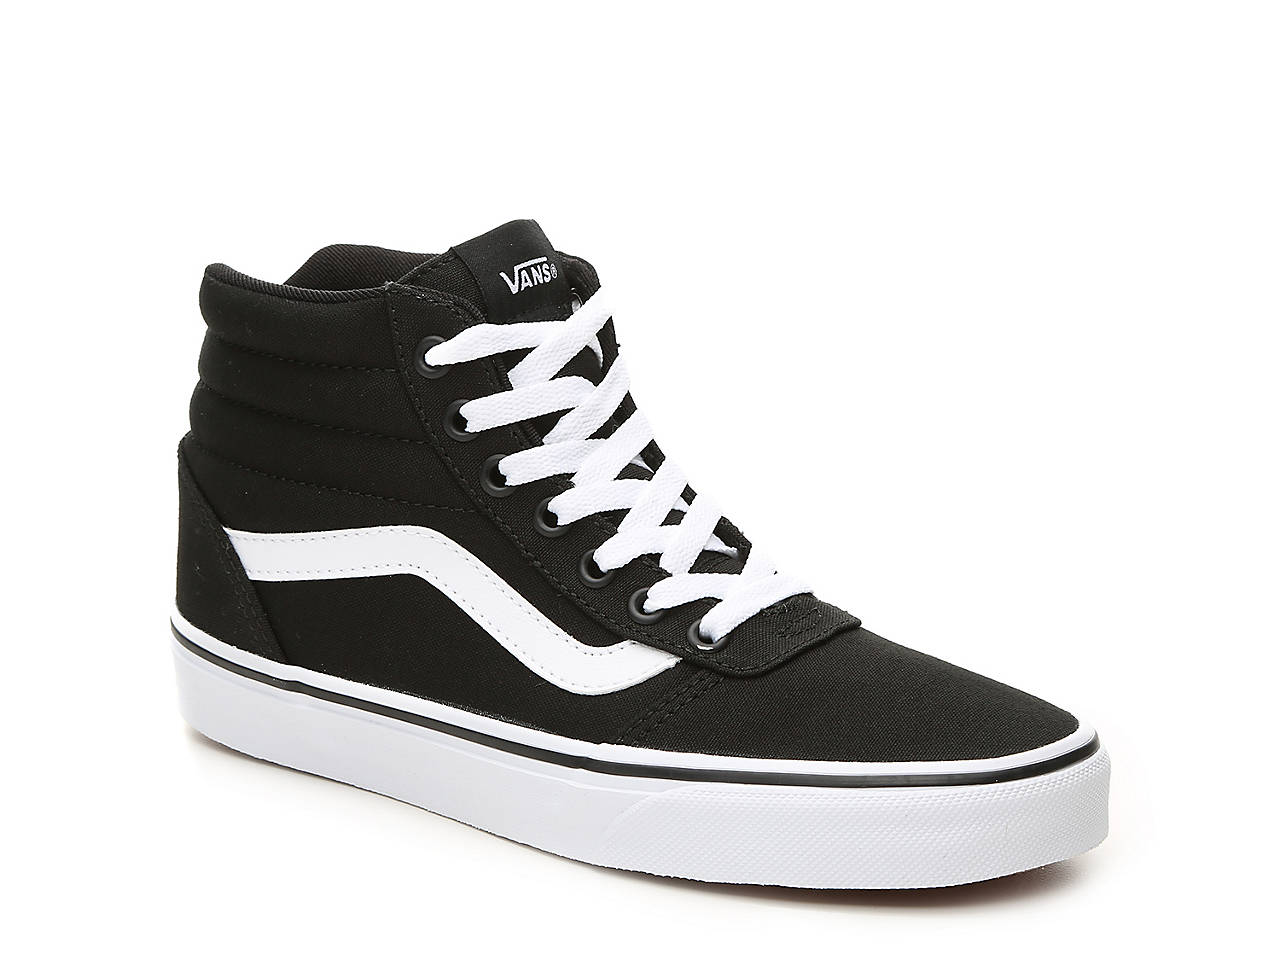 88cdf36442 Vans Ward High-Top Sneaker - Women s Women s Shoes